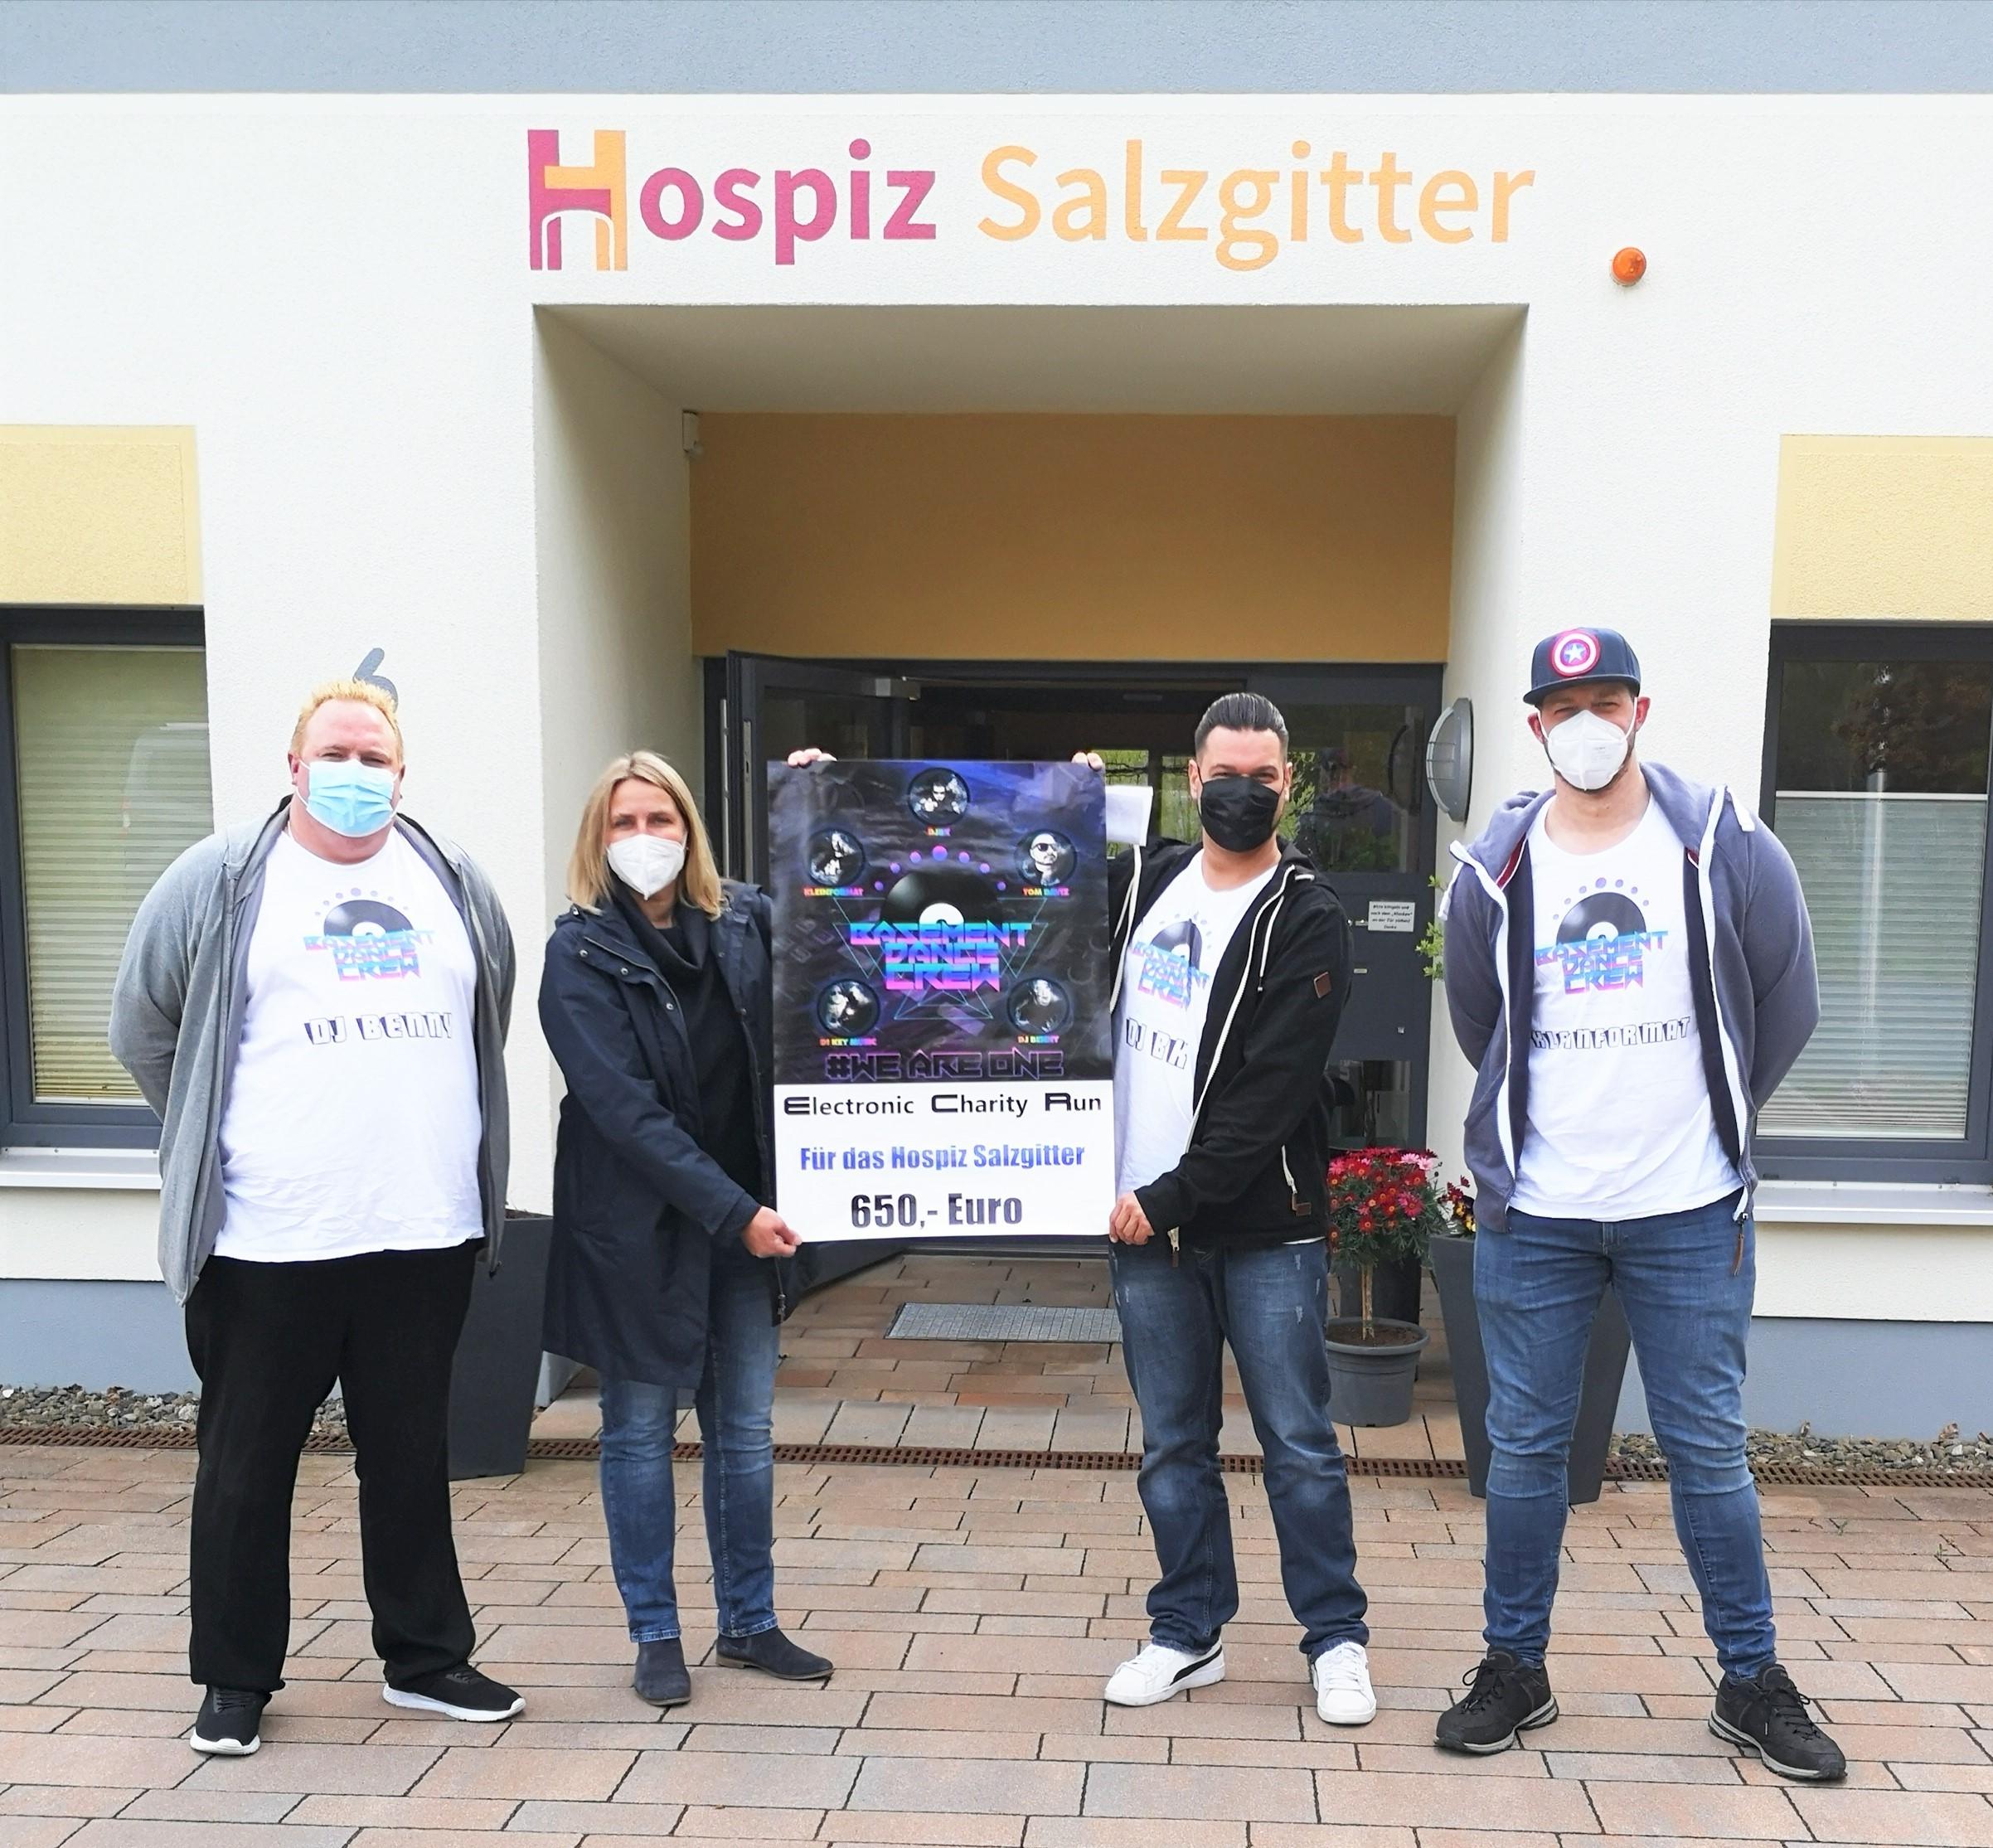 Hospiz Salzgitter - DJ`s